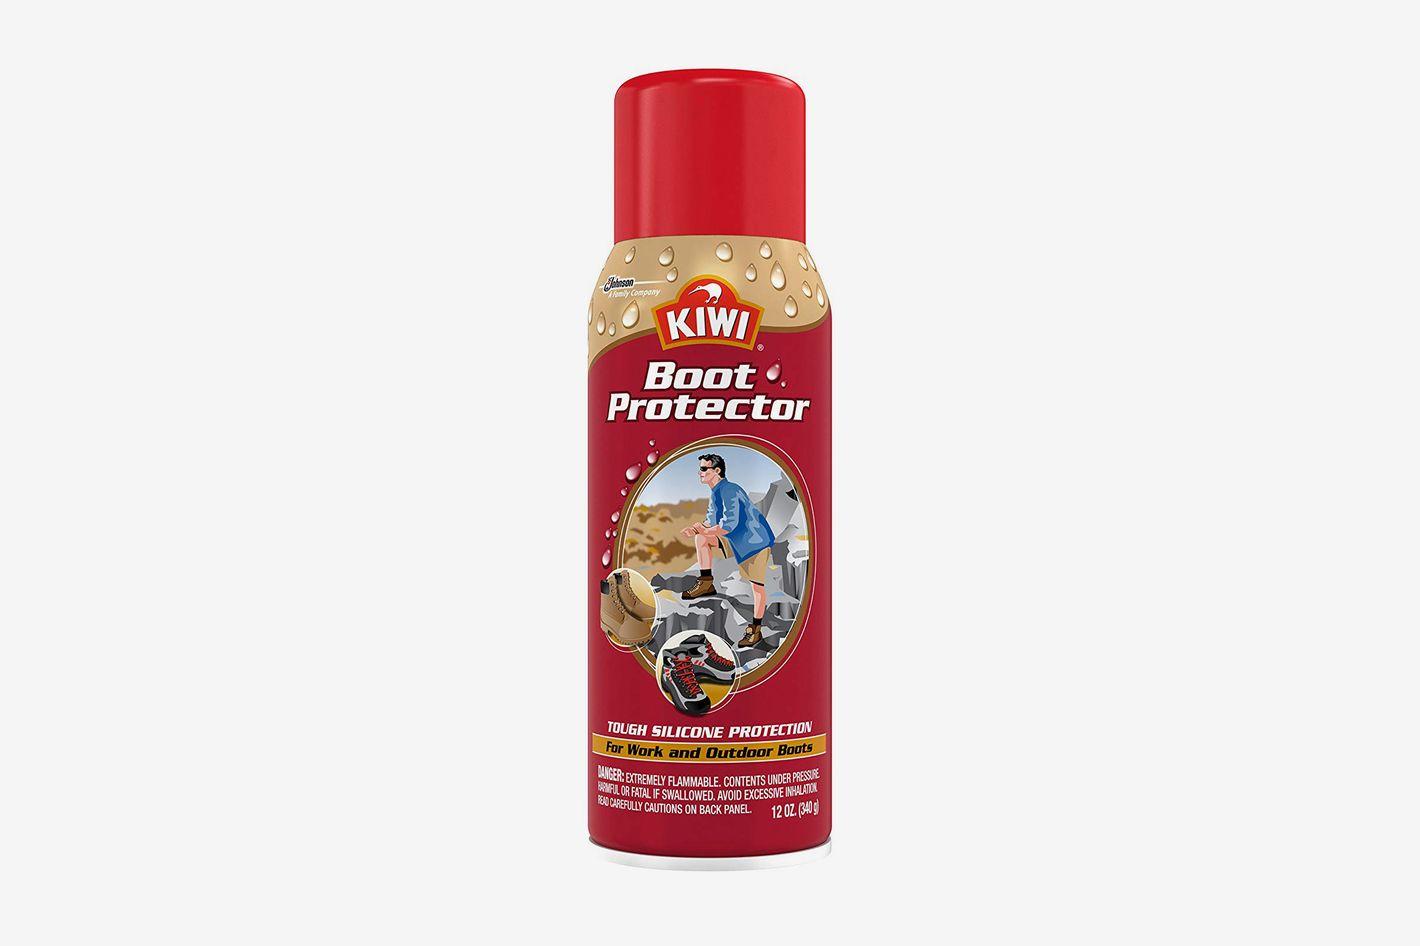 Kiwi Boot Protector